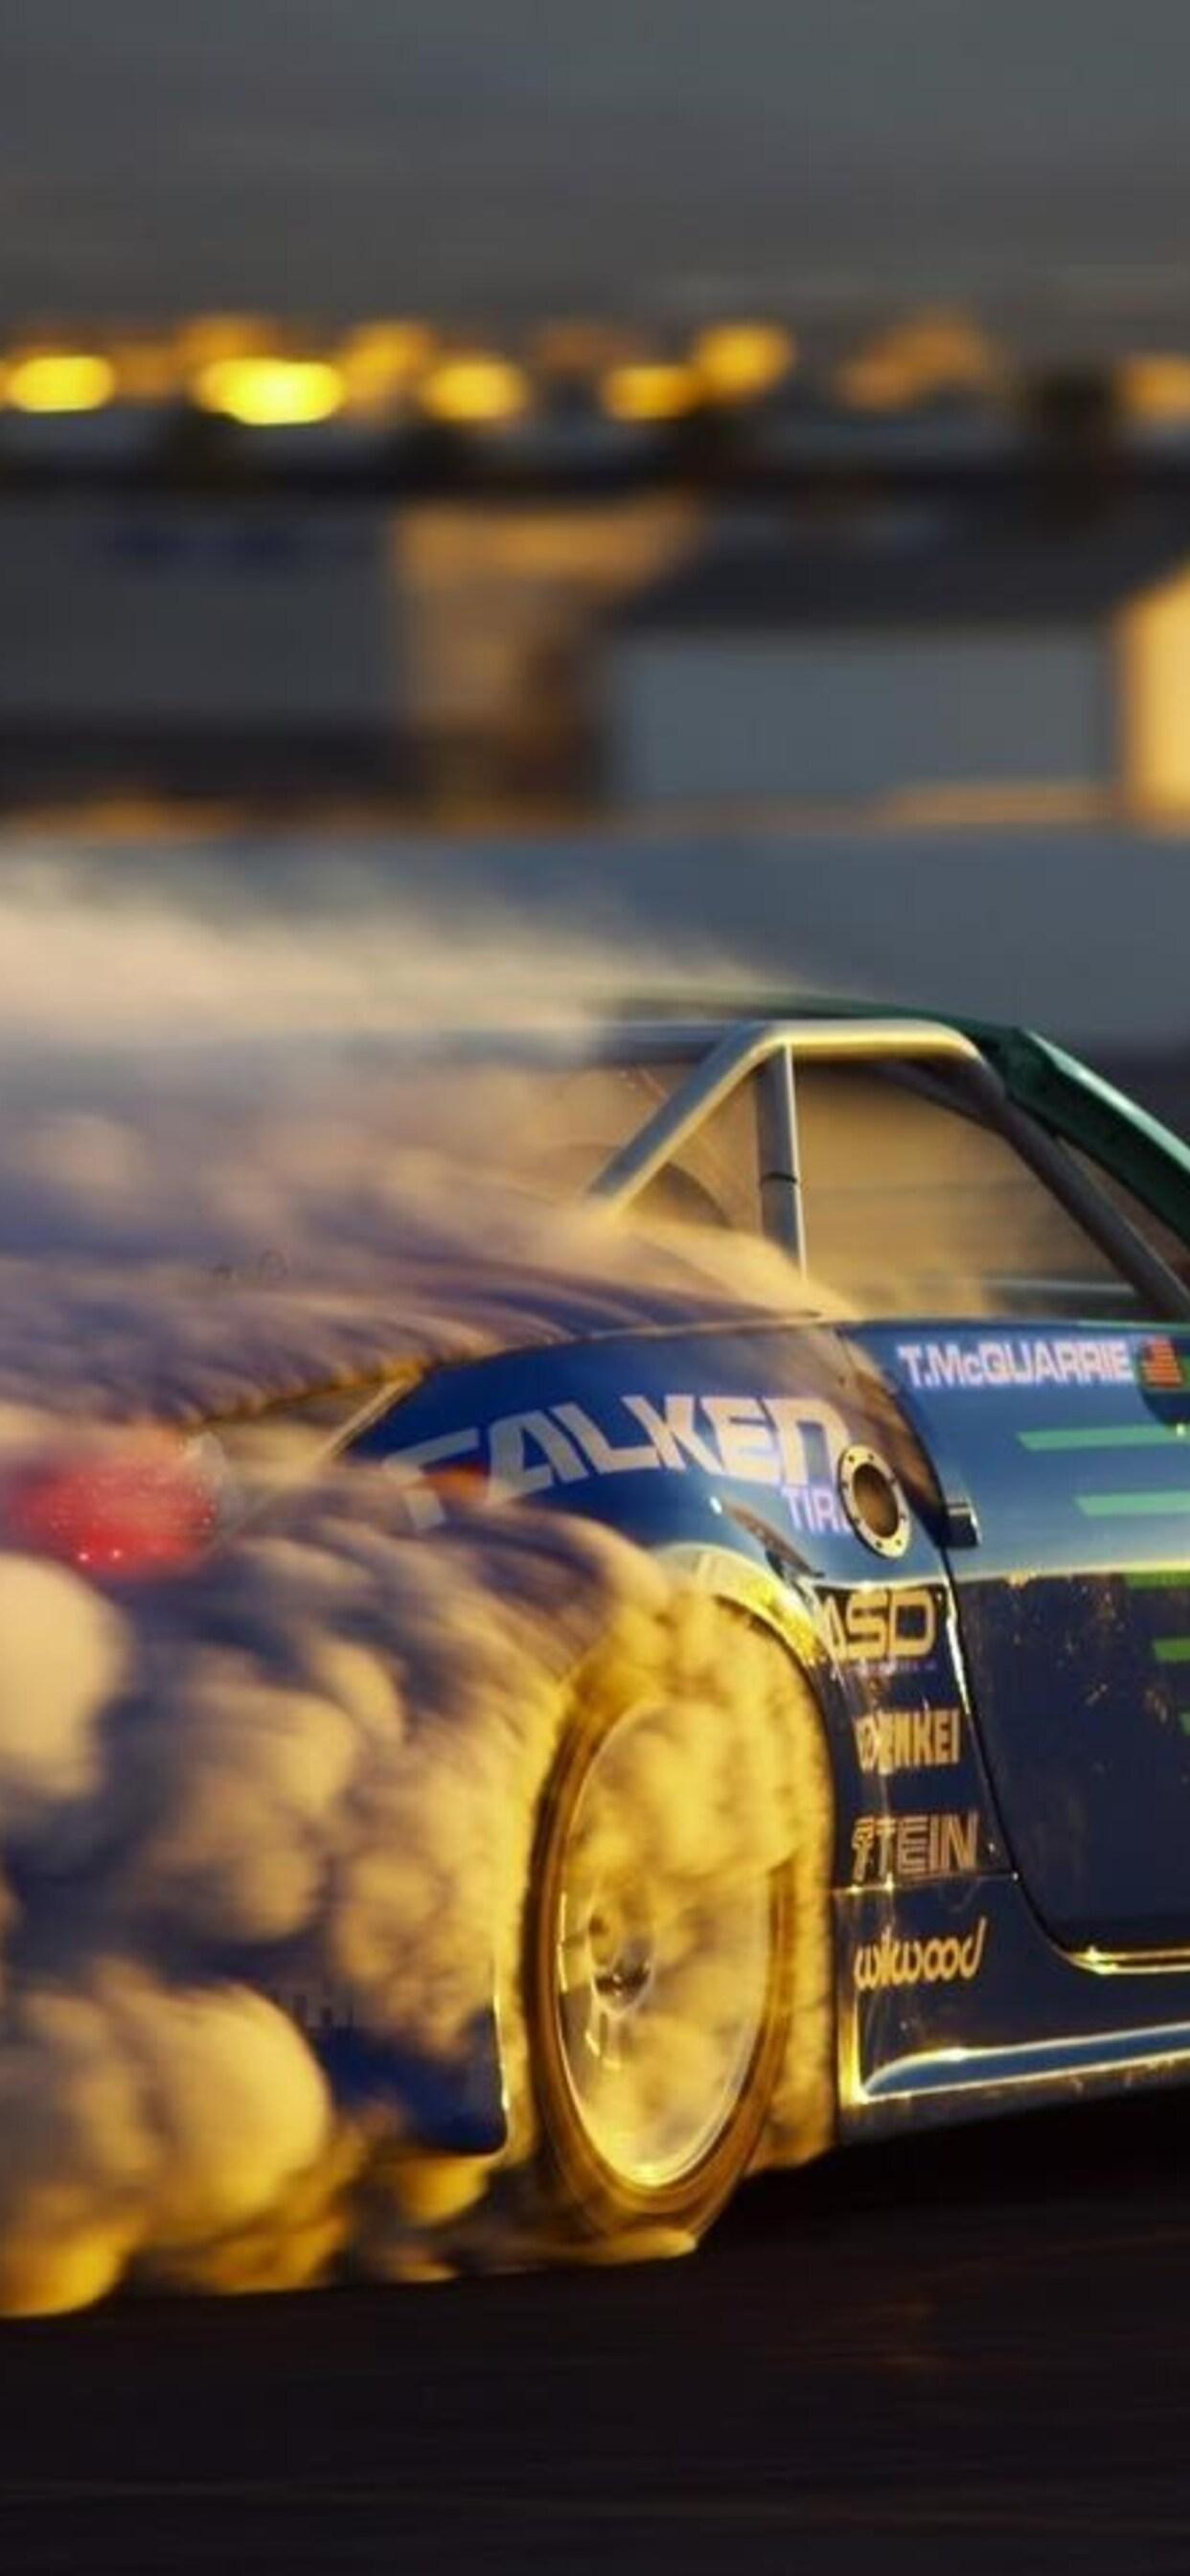 Car Drift Tires Wallpaper Jpg